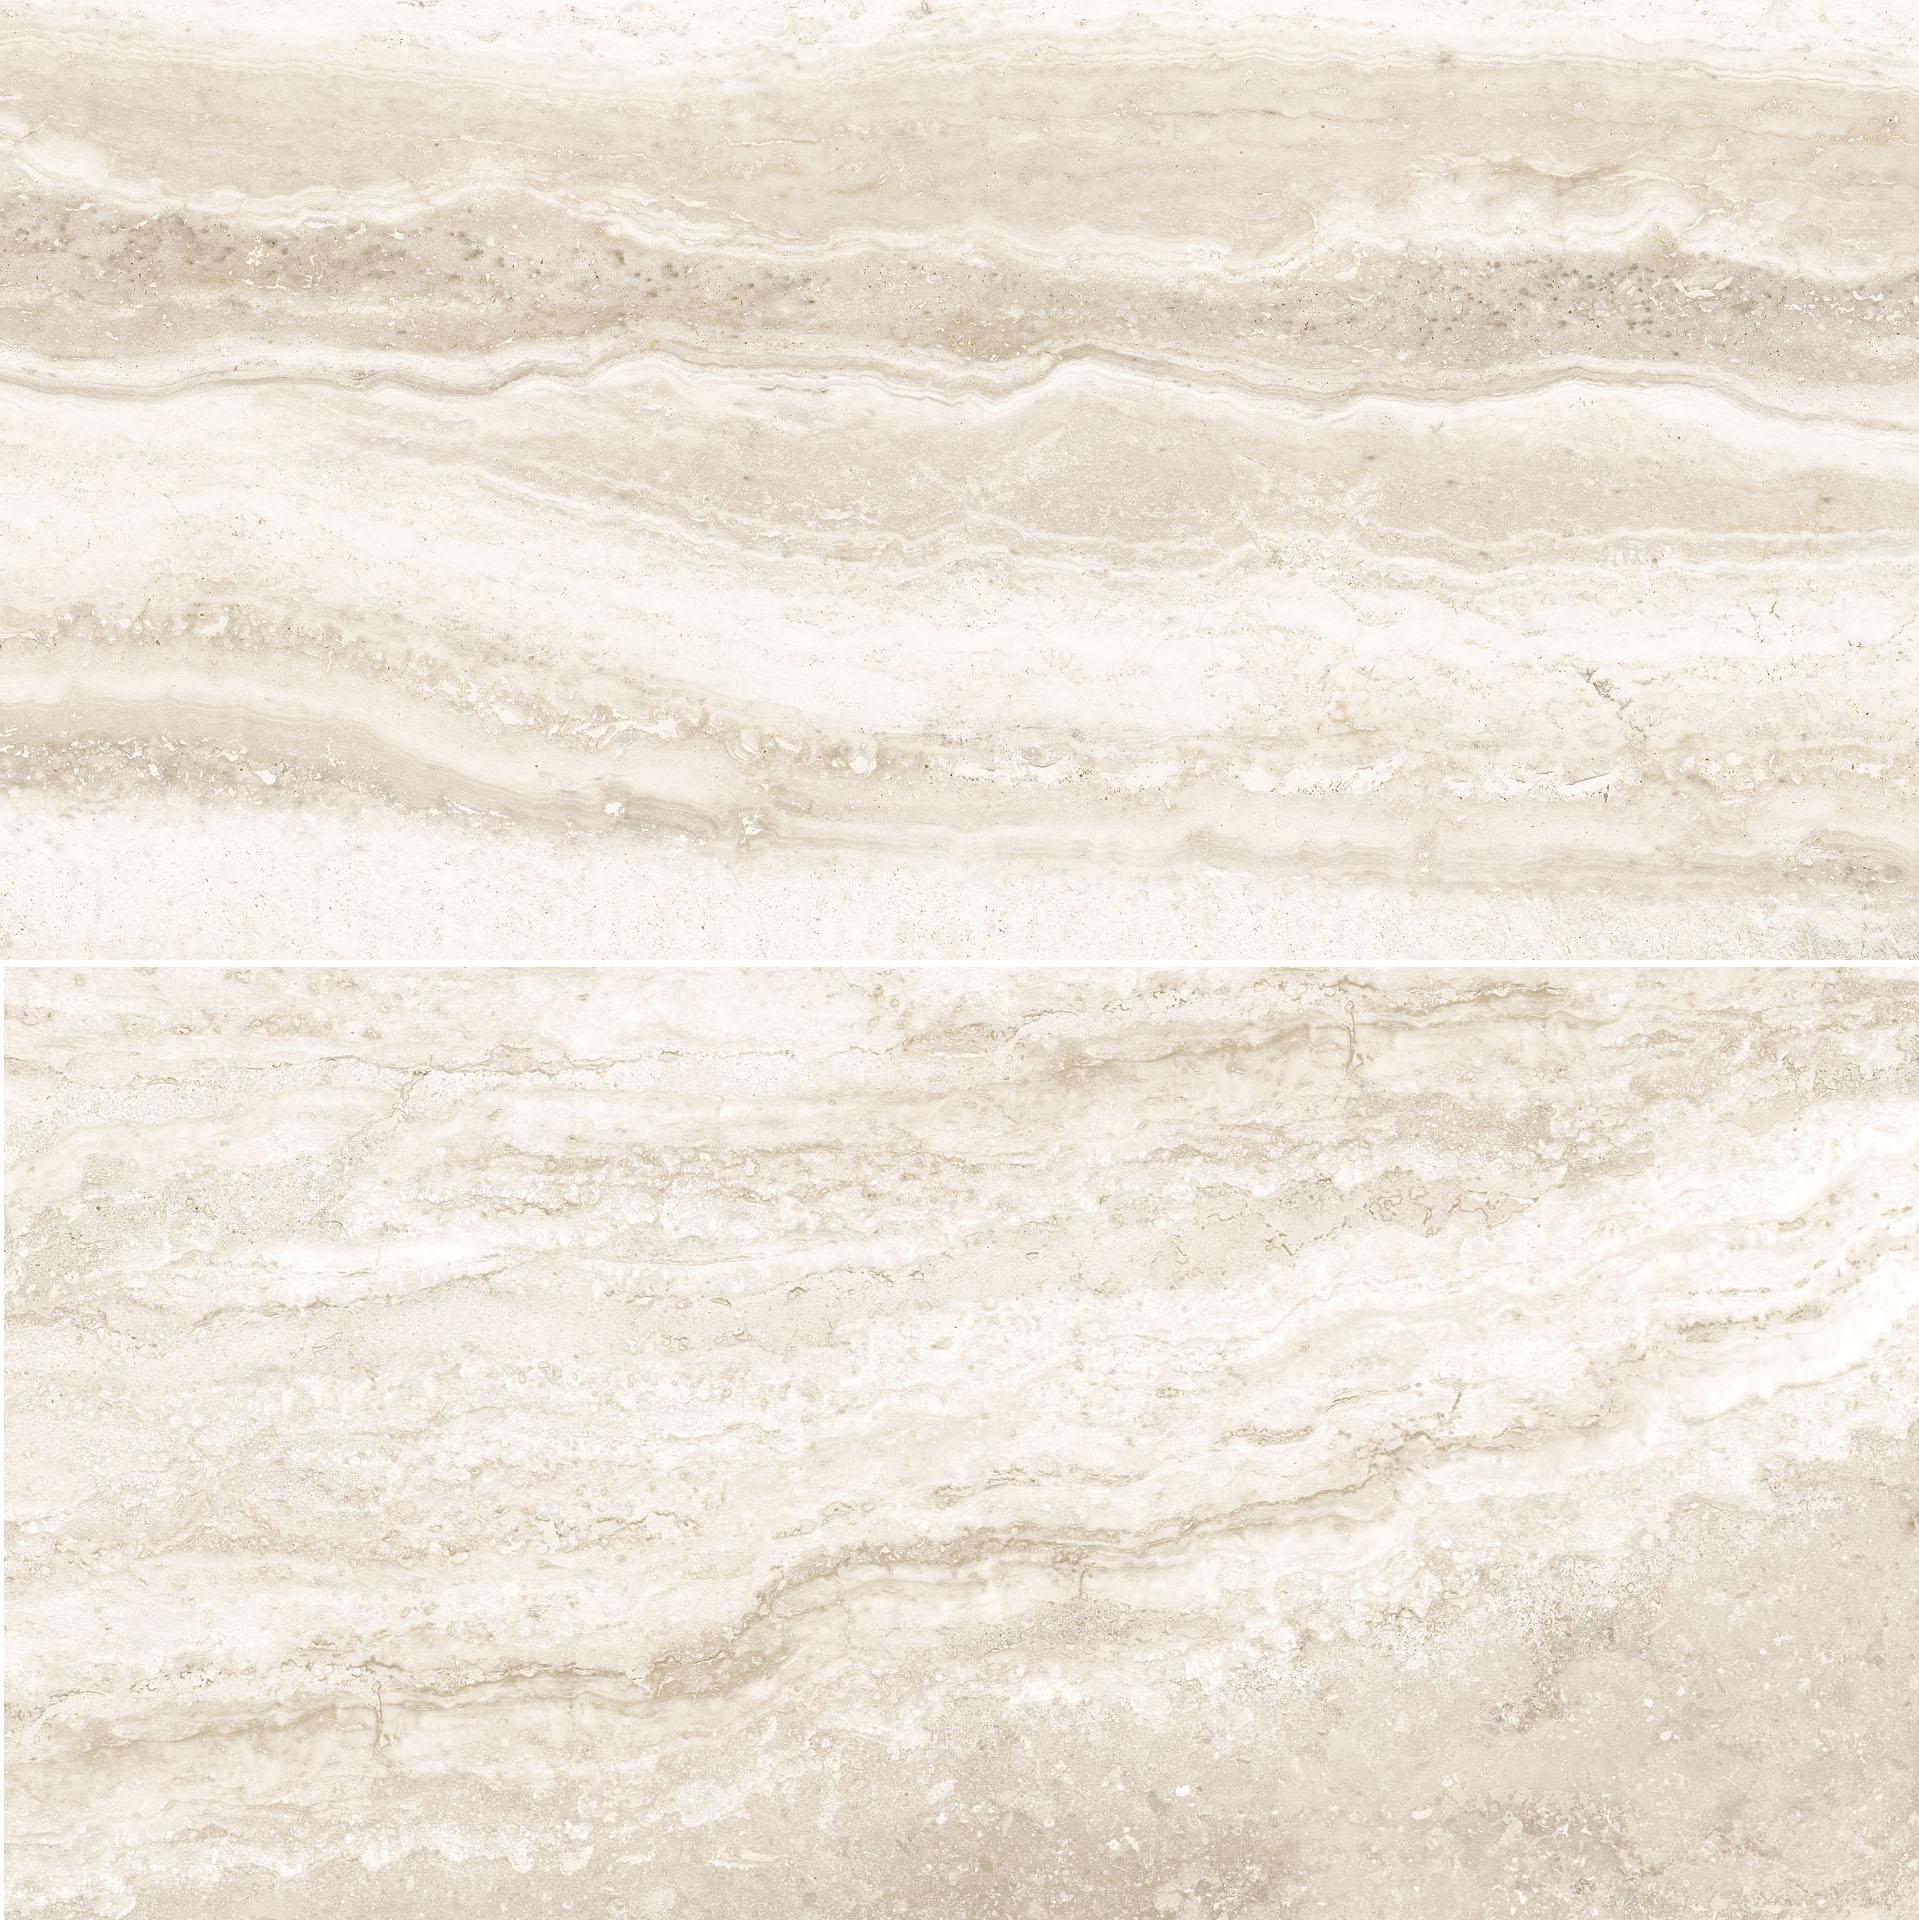 Jupiter ivory 12x24 18x18 porcelain floor wall tile productsporcelaintilejupiterivory12x24 2a dailygadgetfo Images